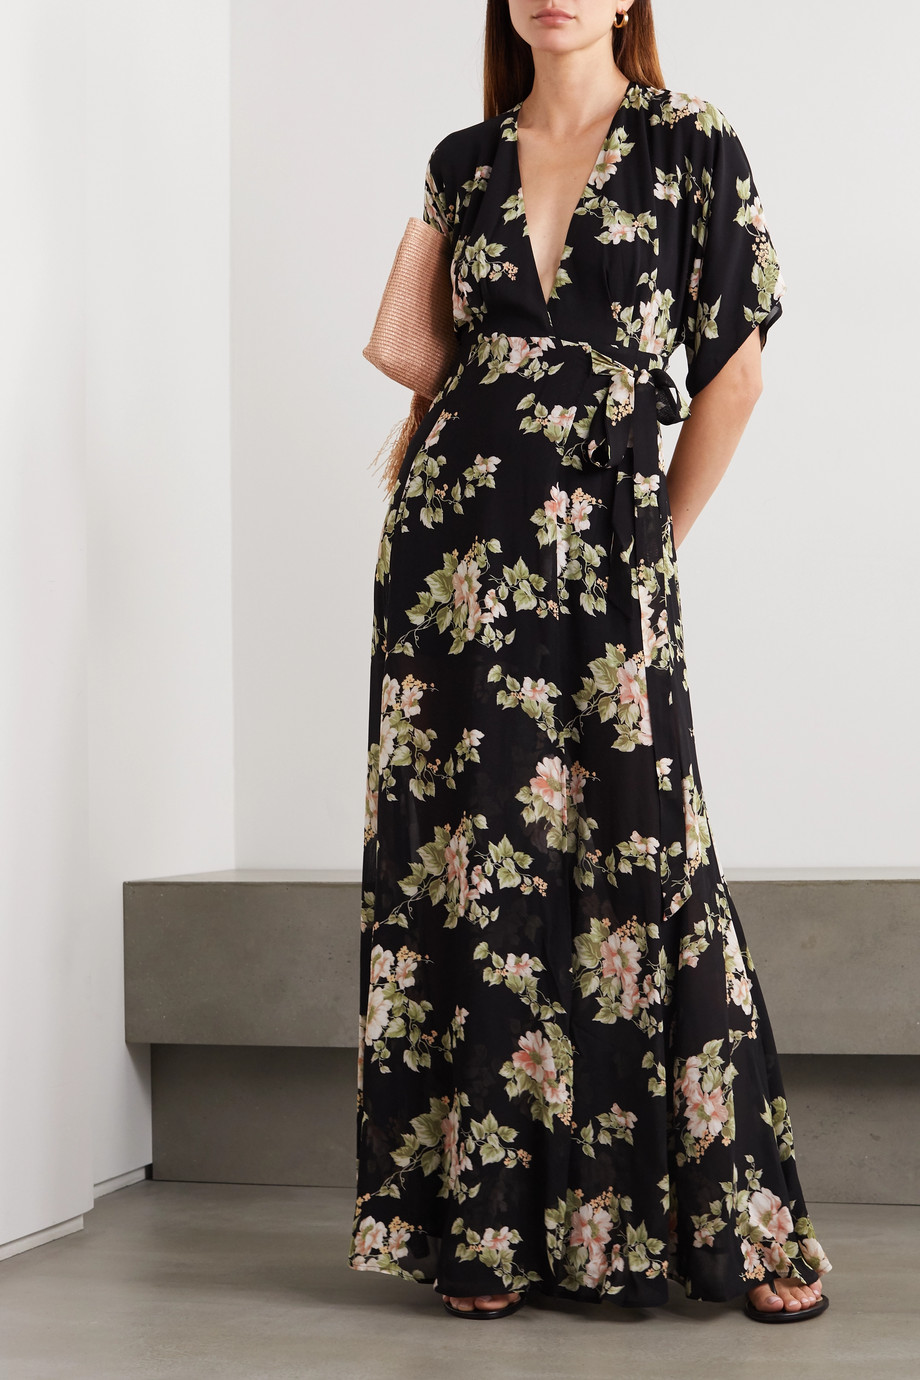 Reformation Winslow 花卉印花乔其纱超长裹身连衣裙